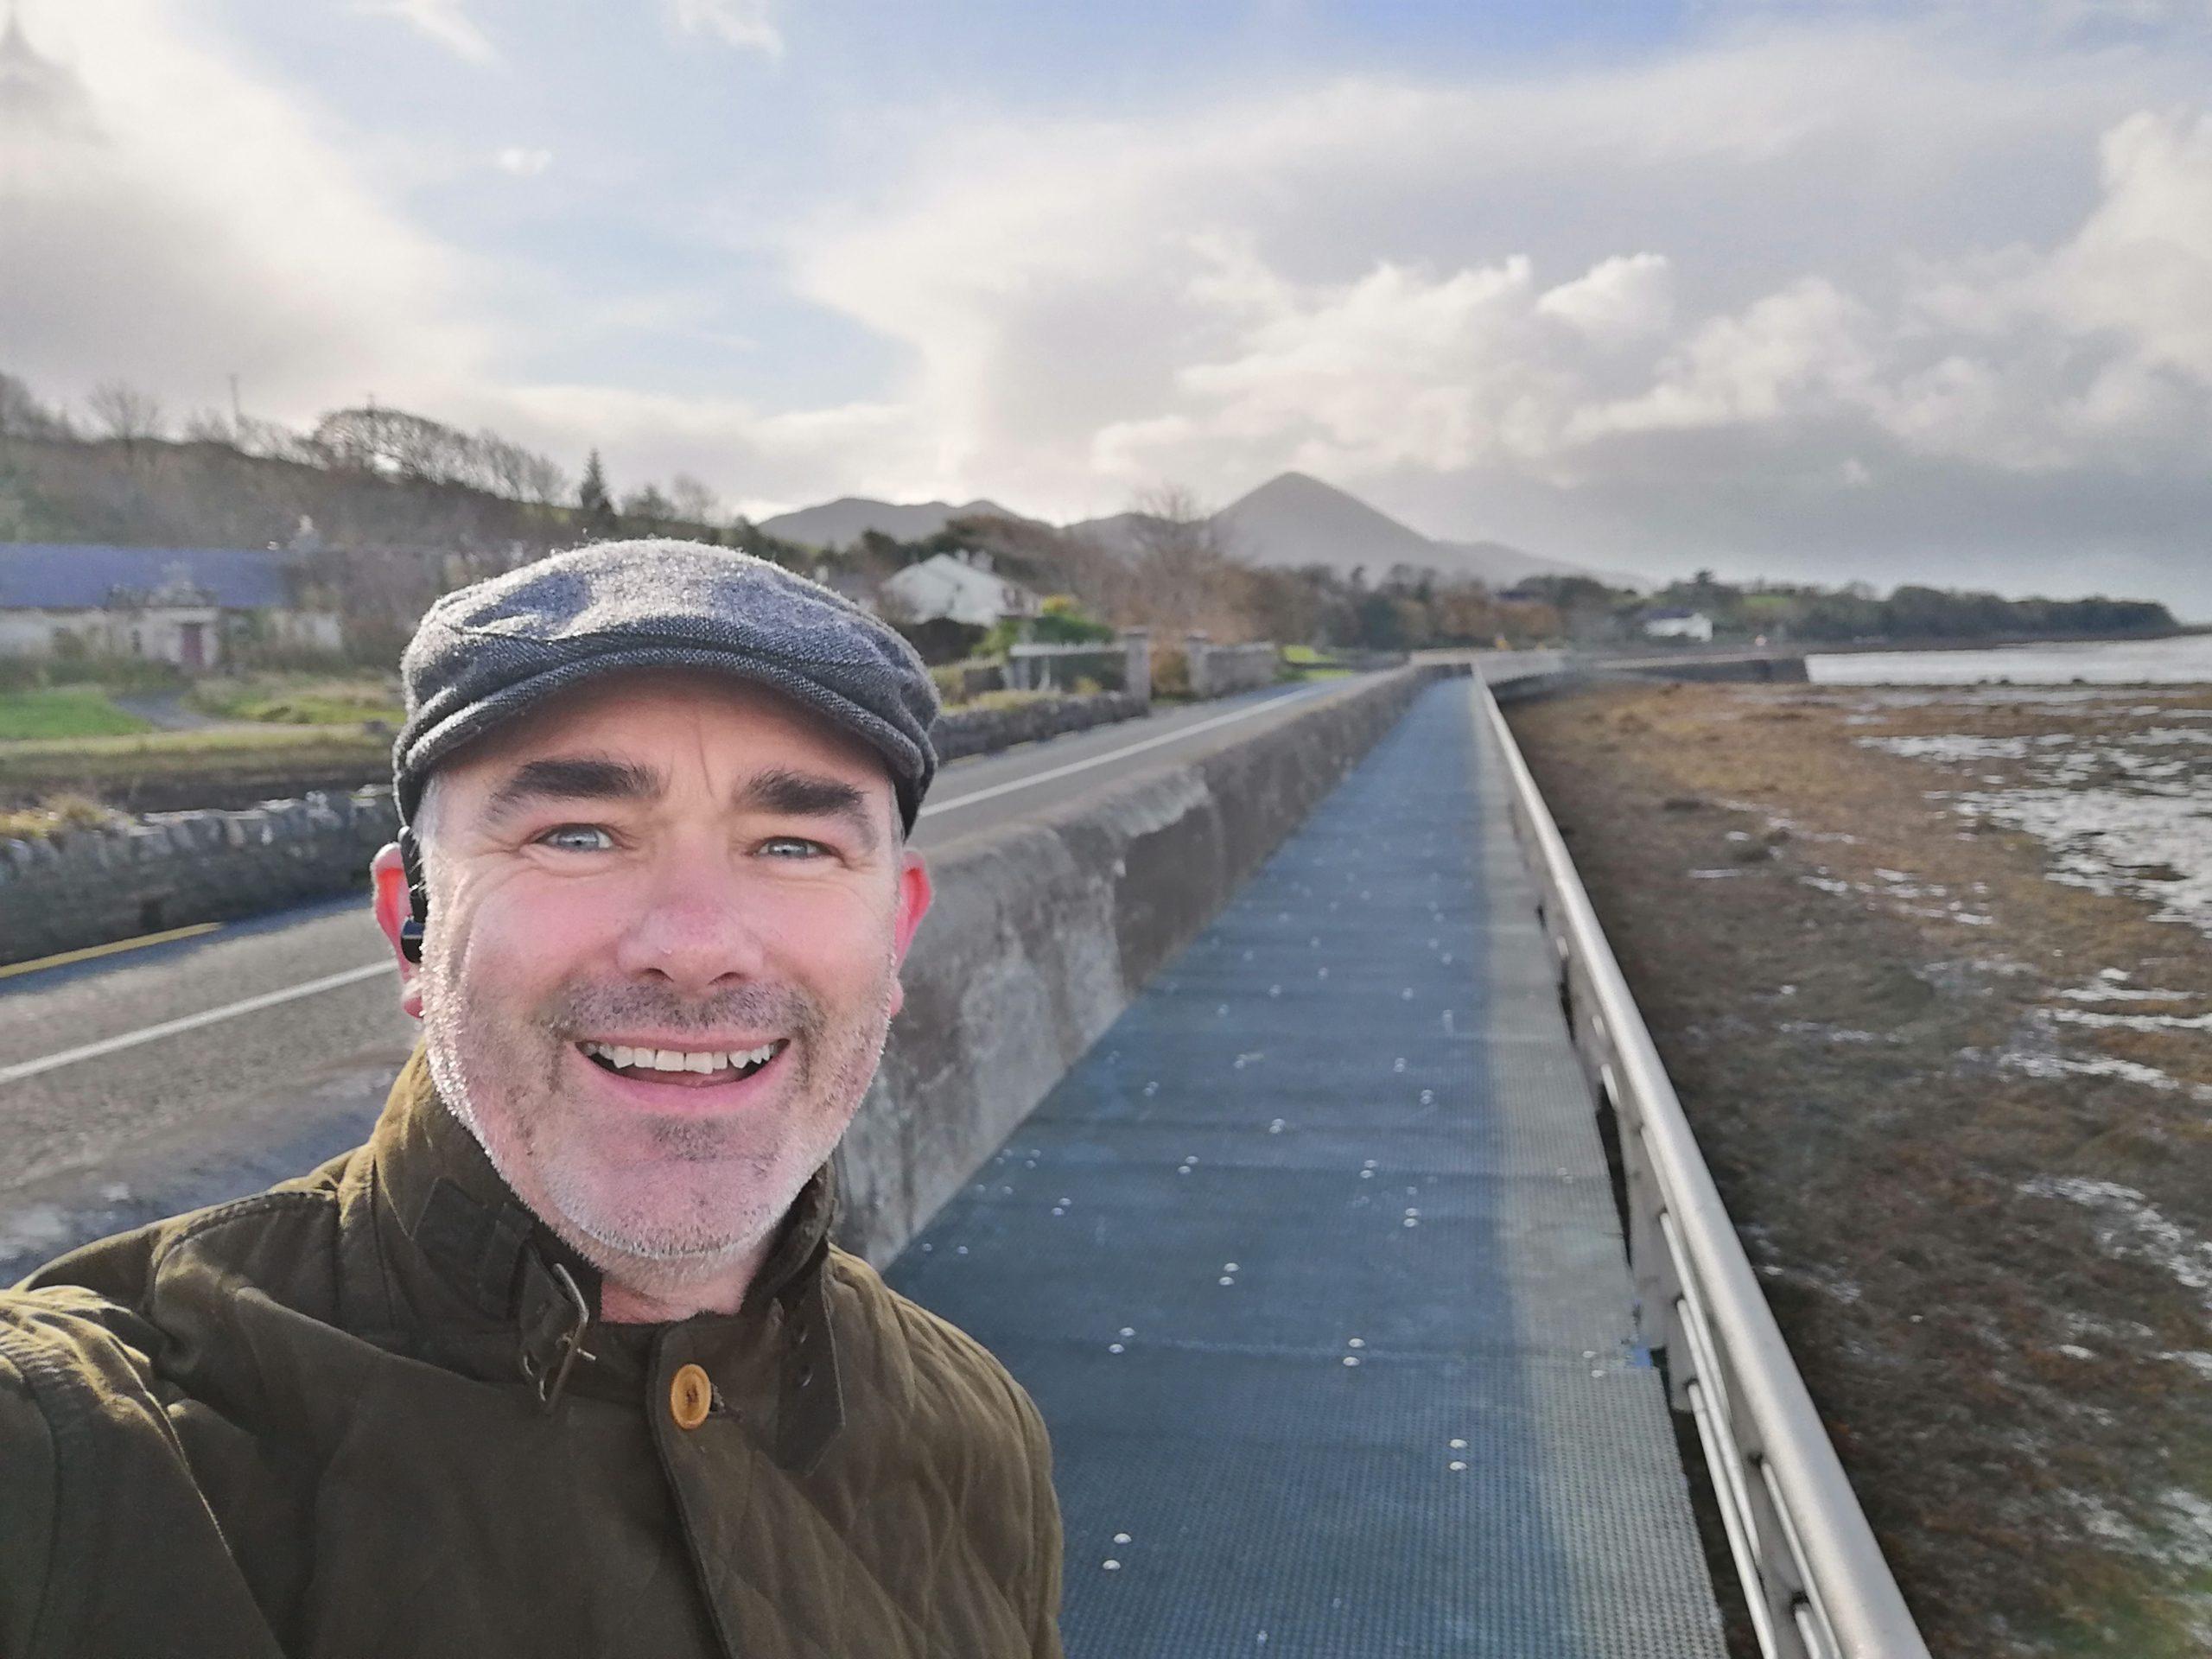 Darren Cawley in his home town of Westport in Co. Mayo